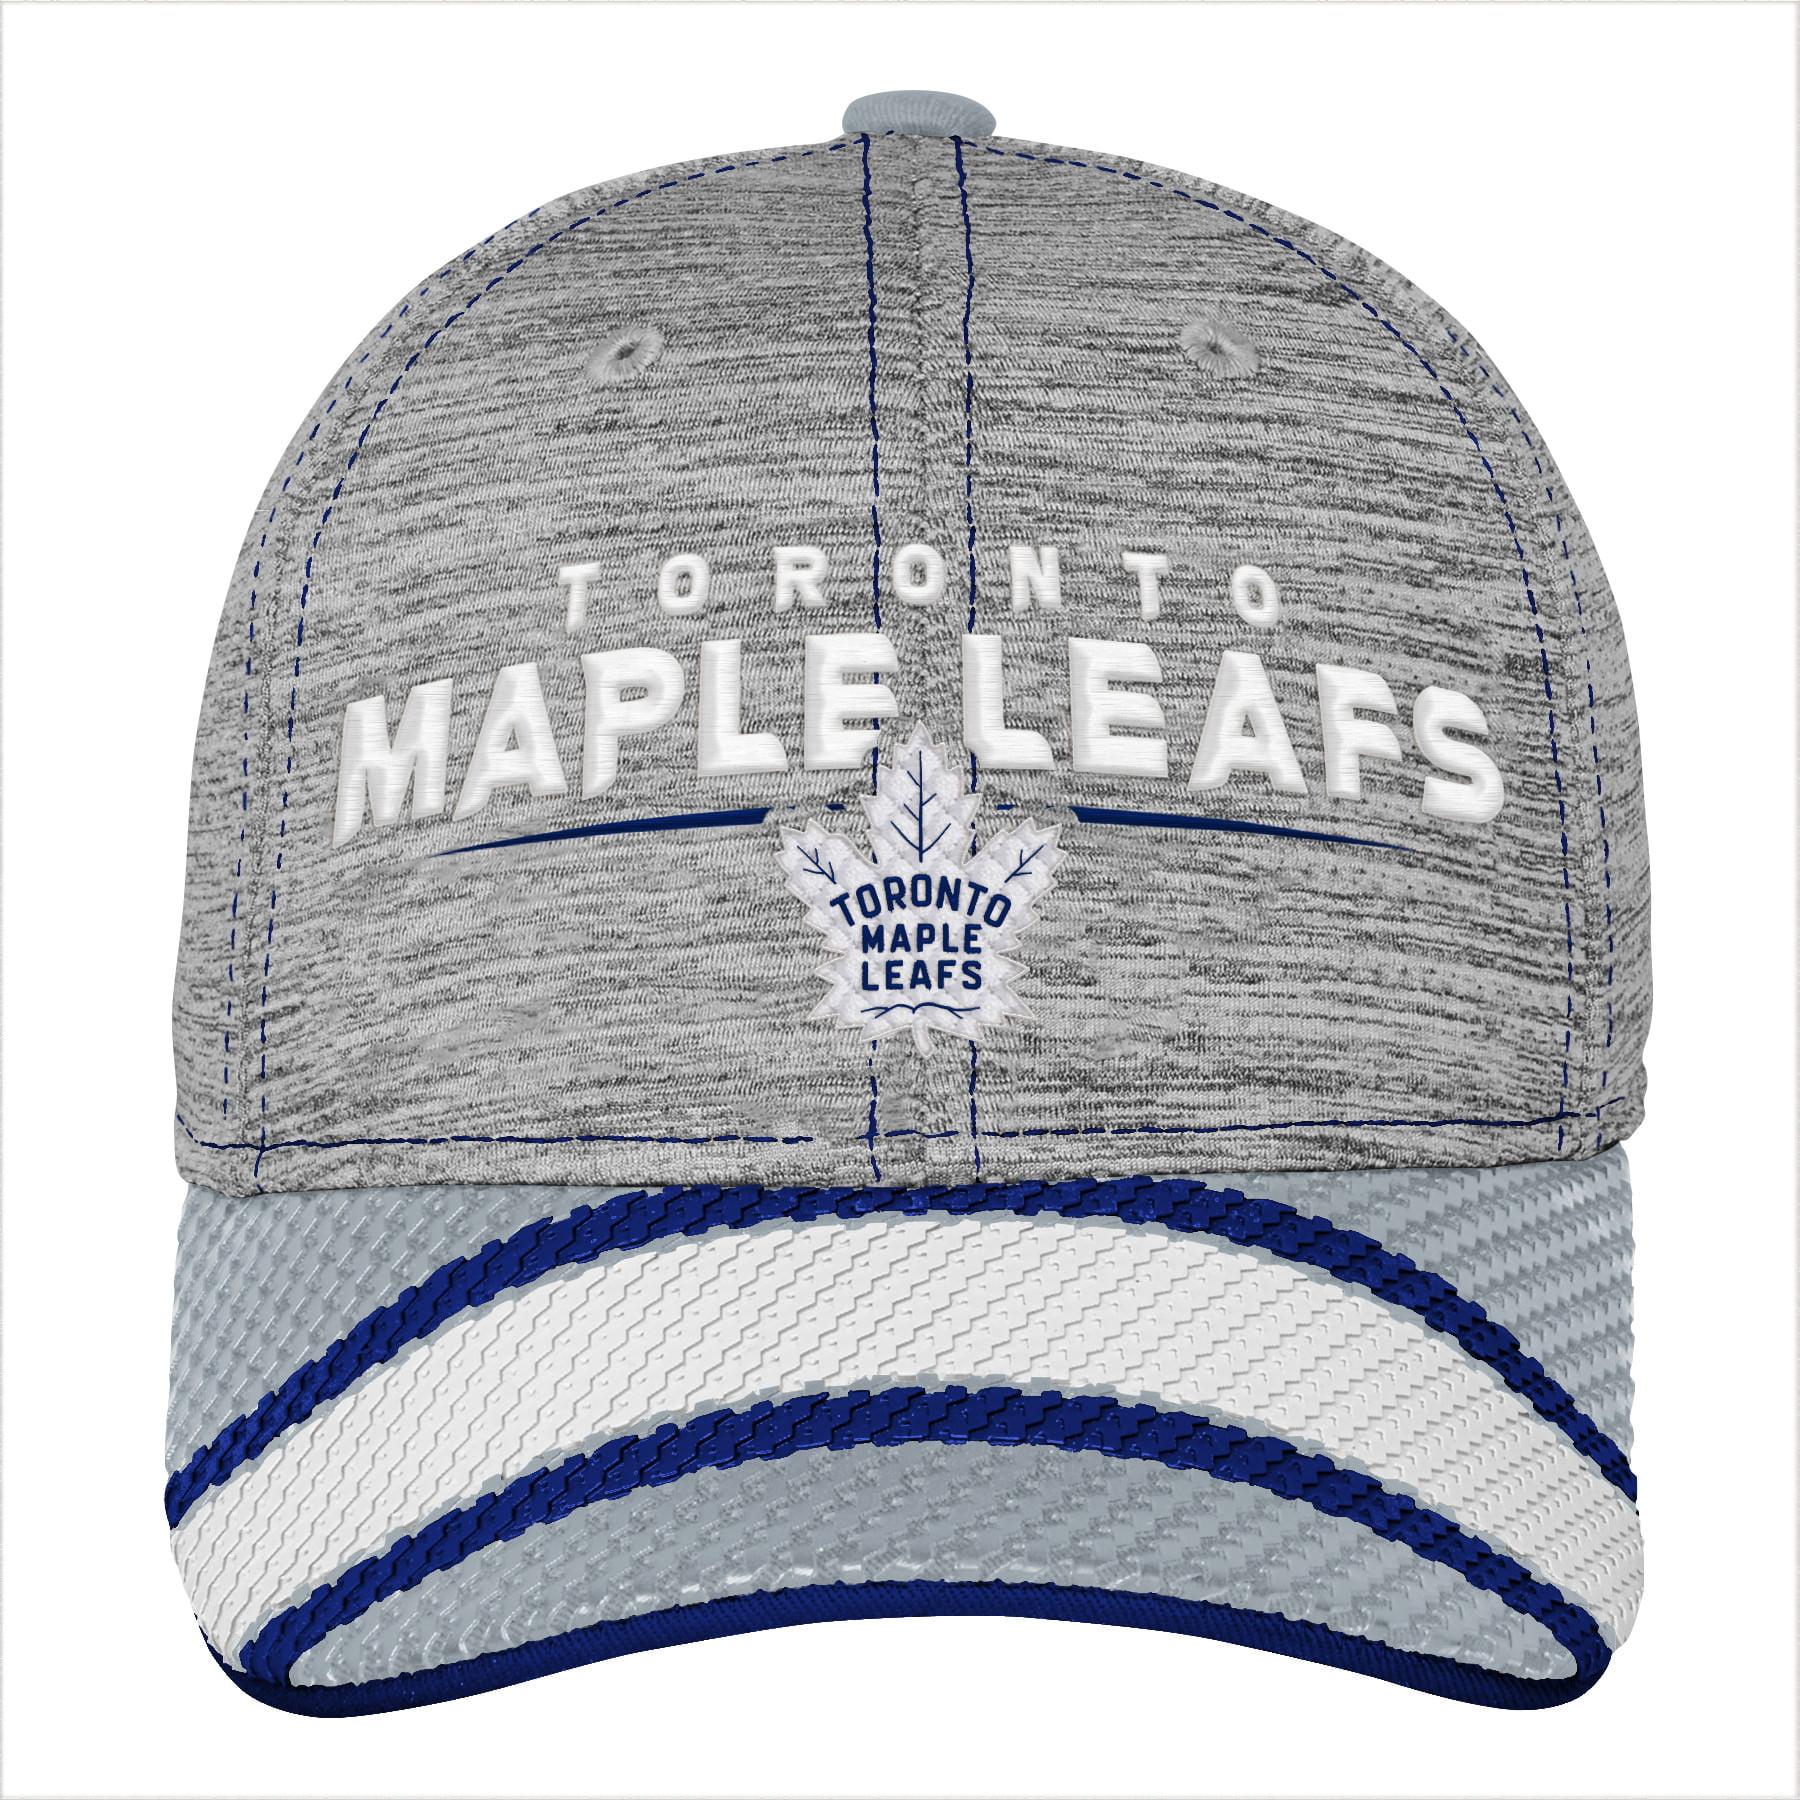 48c1abb352a Youth Toronto Maple Leafs Second Season Player Cap